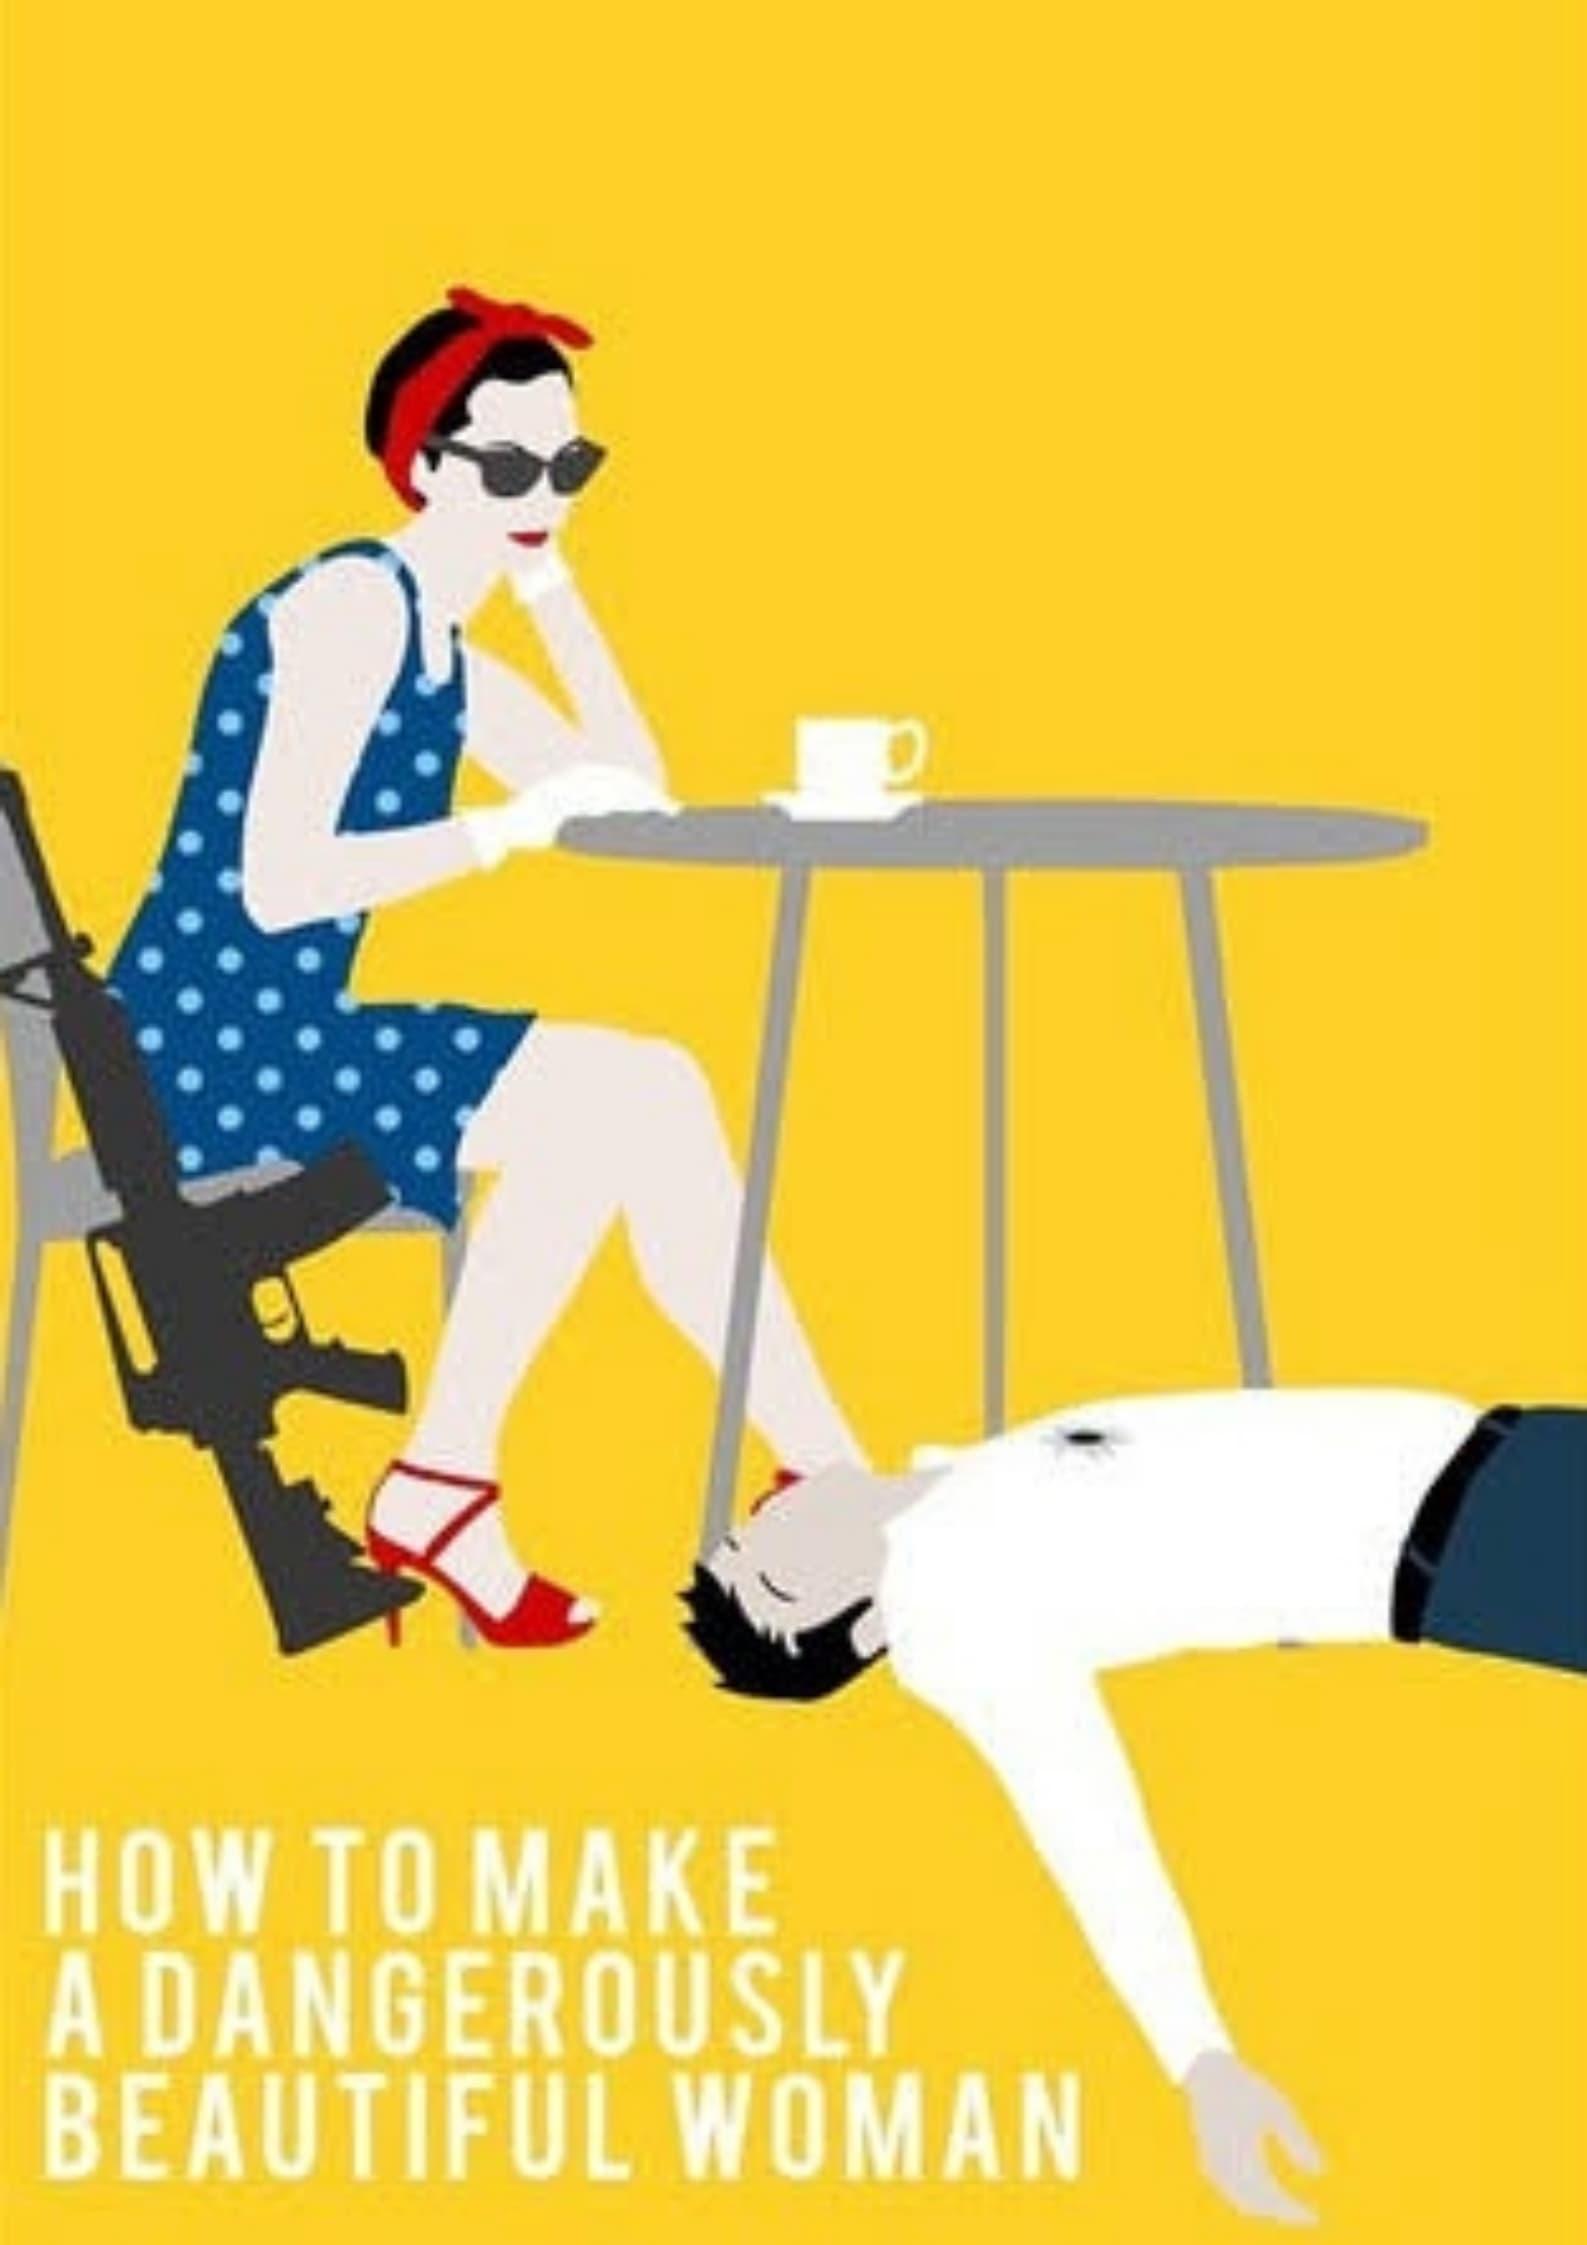 How To Make A Dangerously Beautiful Woman